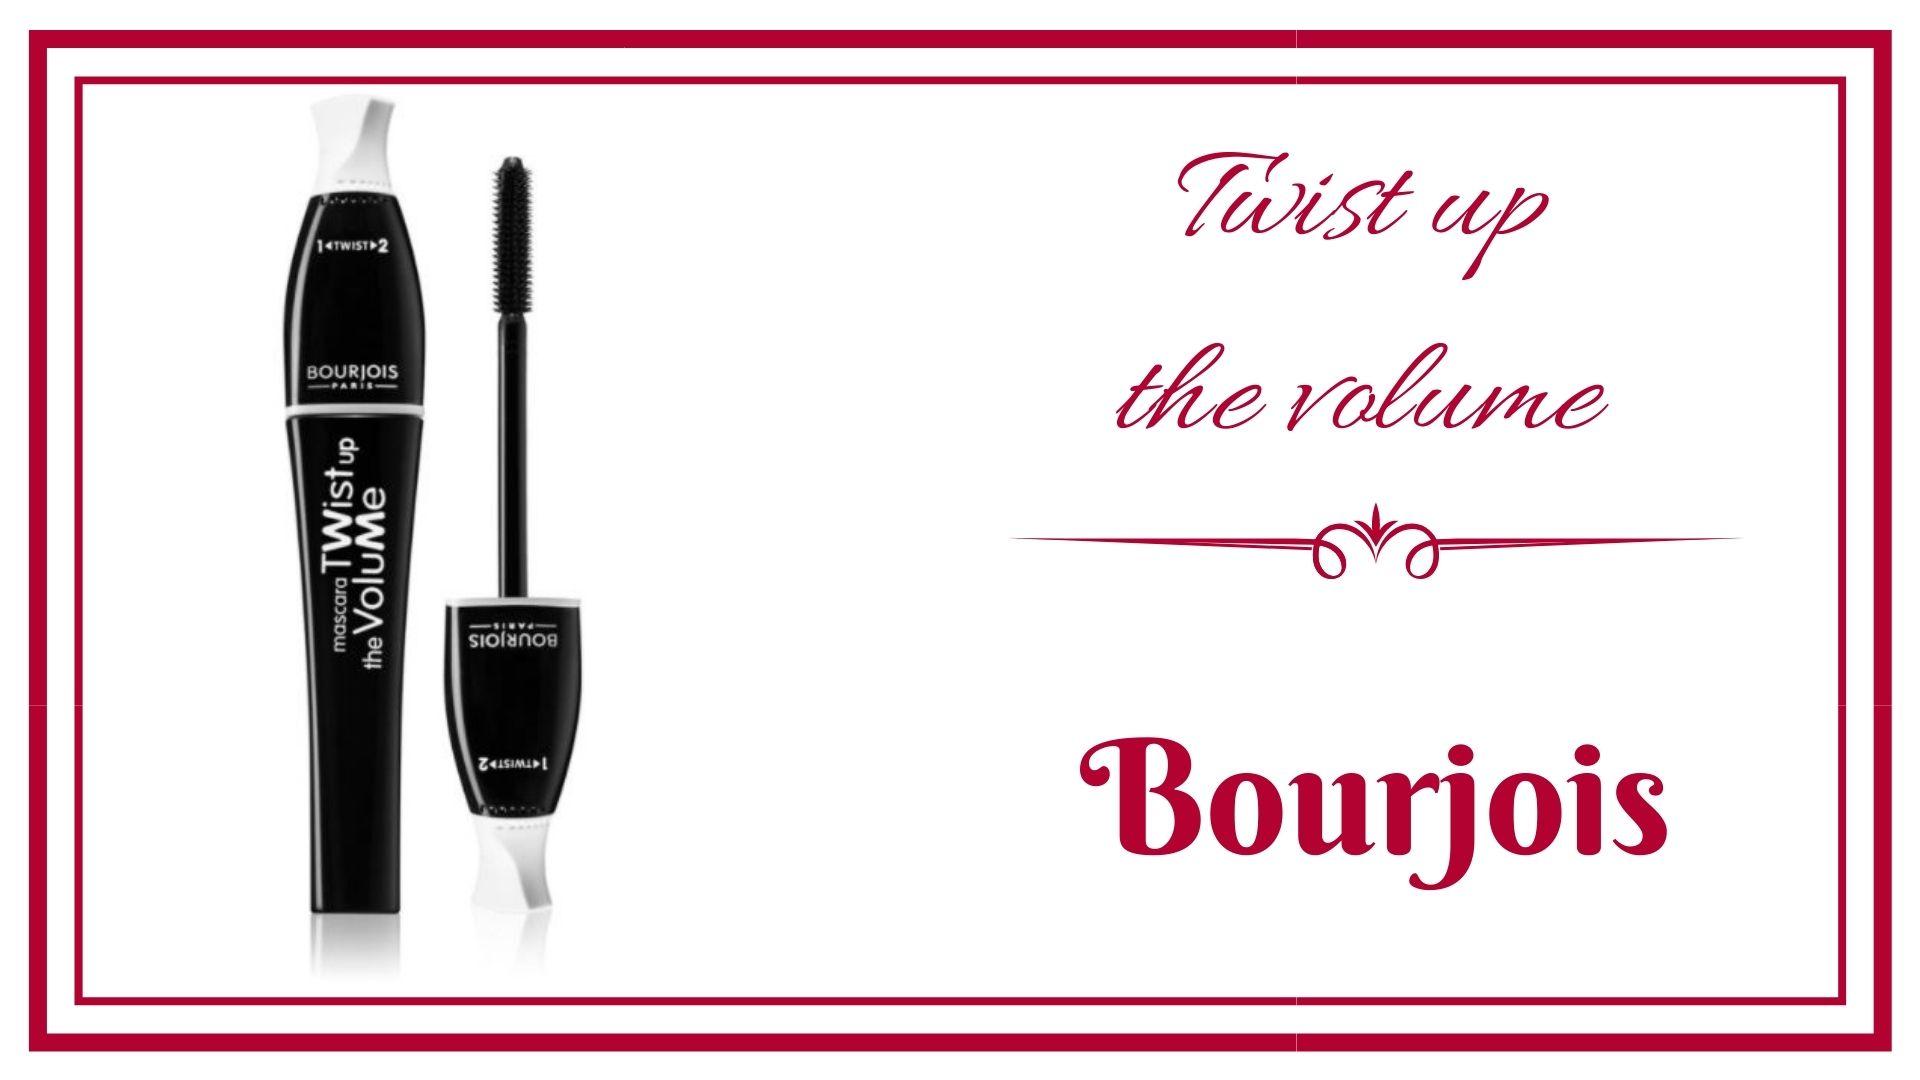 LOG frivole et Futile mascara twist up th volume bourjois (1)